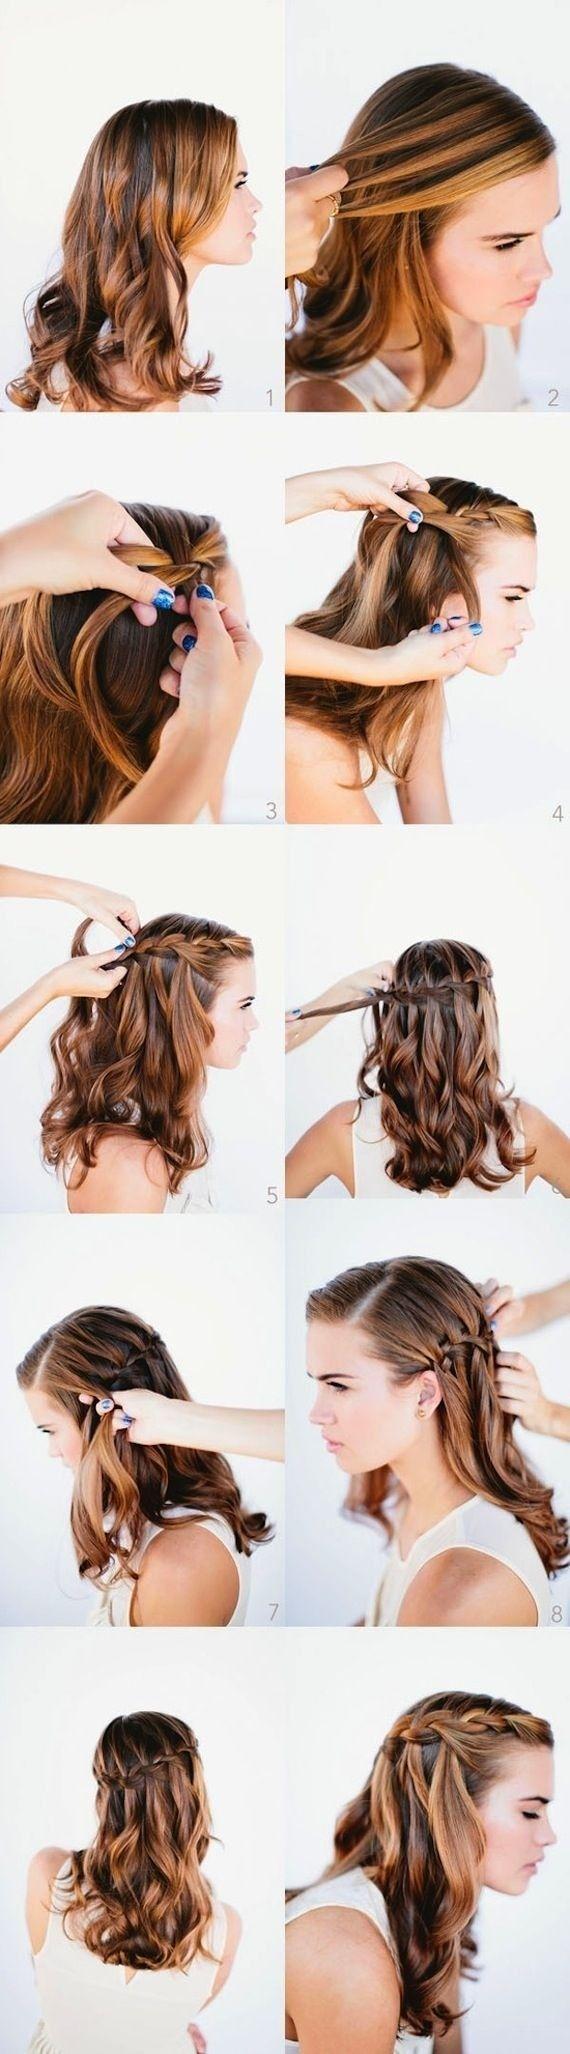 Waterfall Braid Tutorial: Prom Hairstyles Ideas 2014